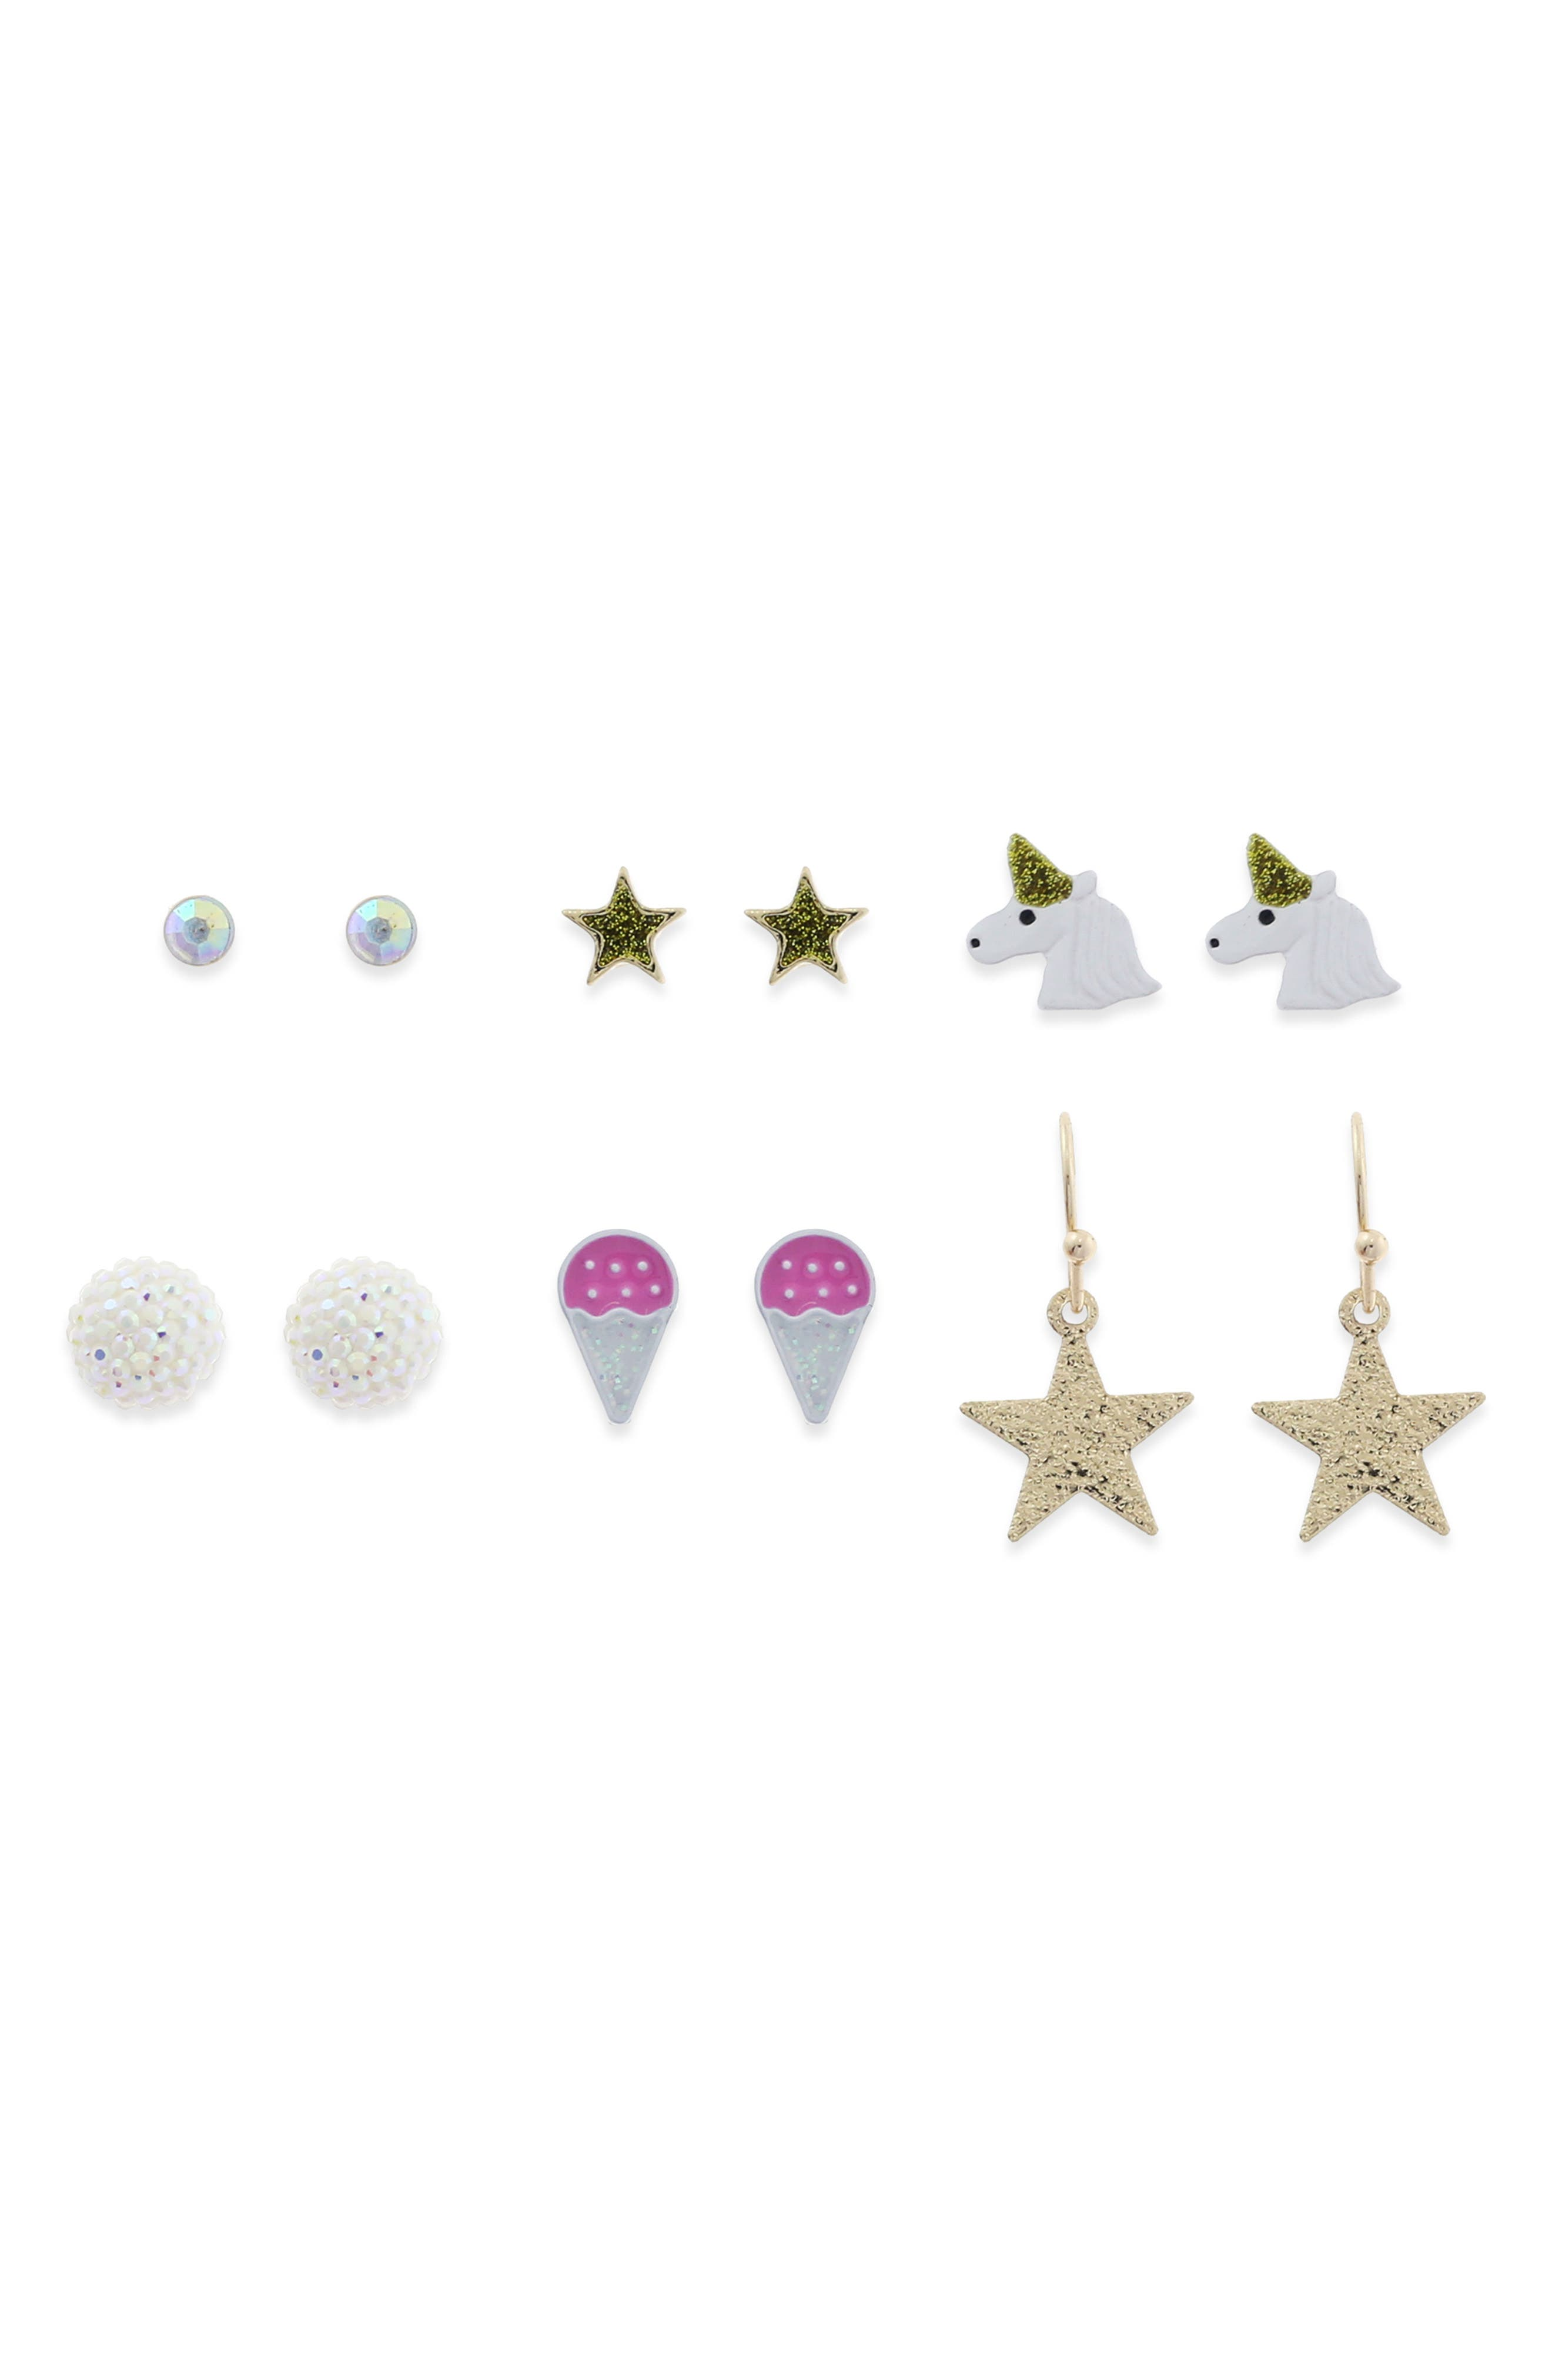 Set of 6 Girl Power Earrings,                             Main thumbnail 1, color,                             710